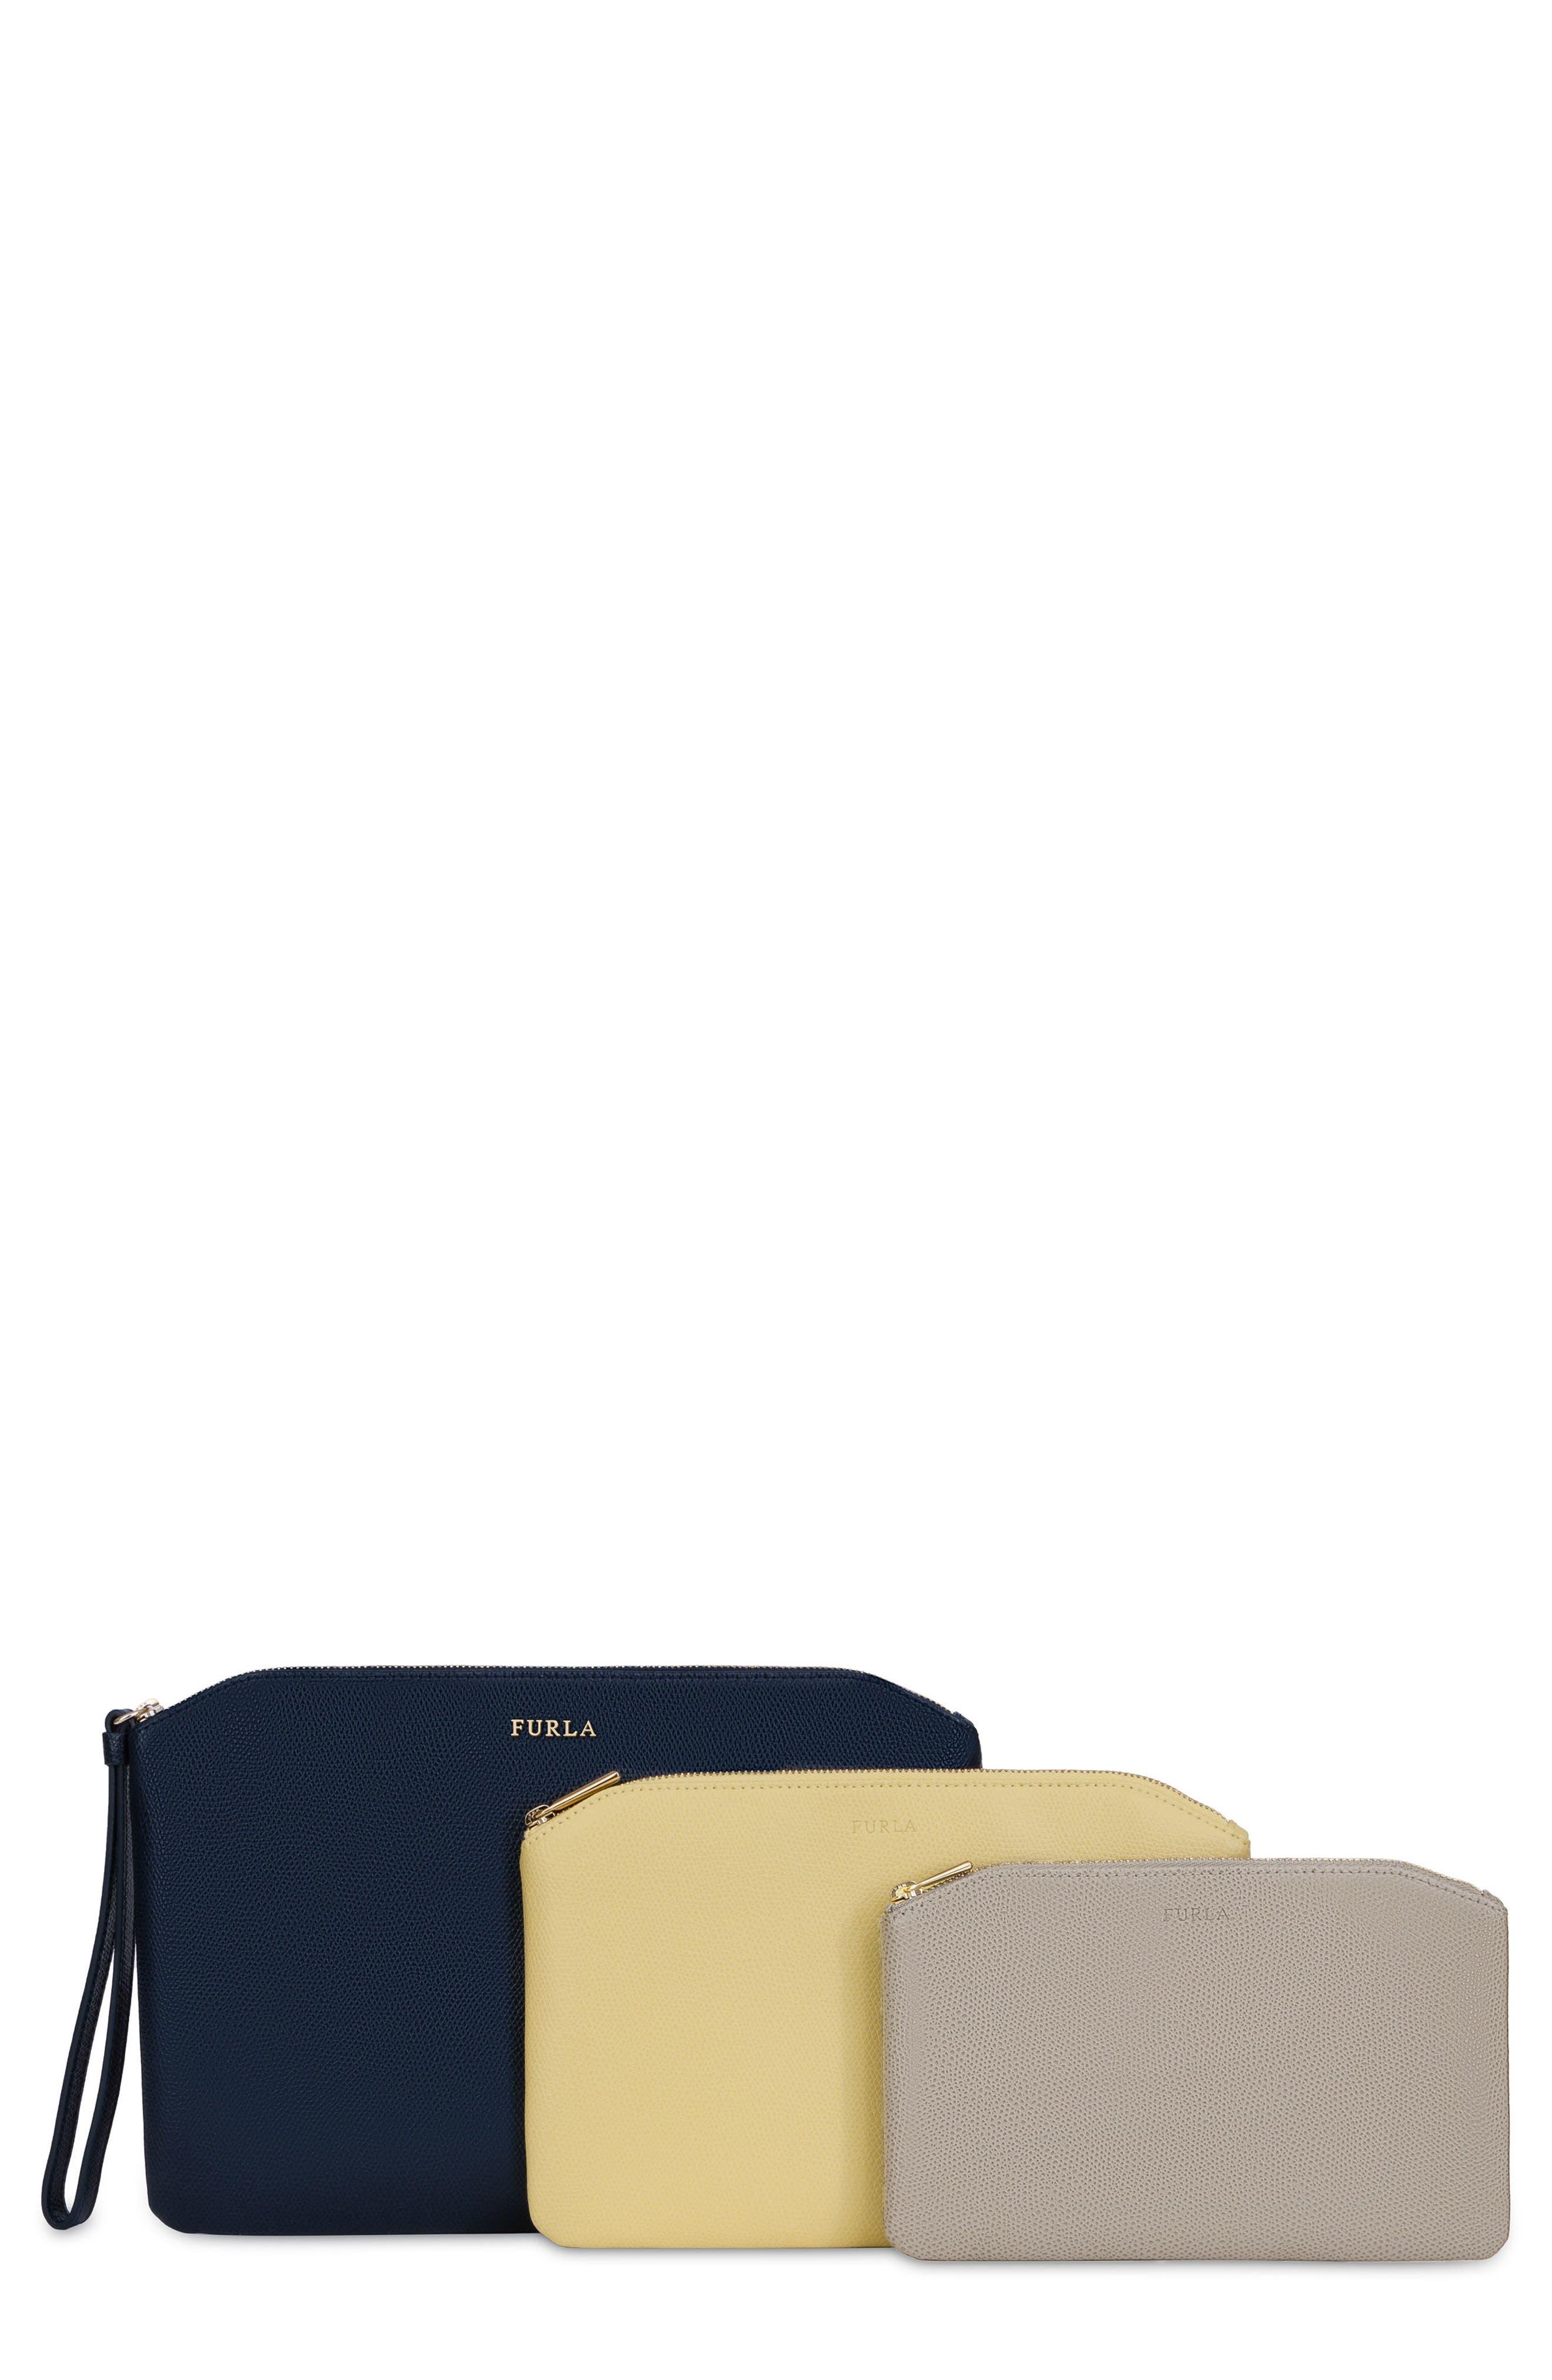 Furla Venere Set of 3 Leather Cosmetic Bags